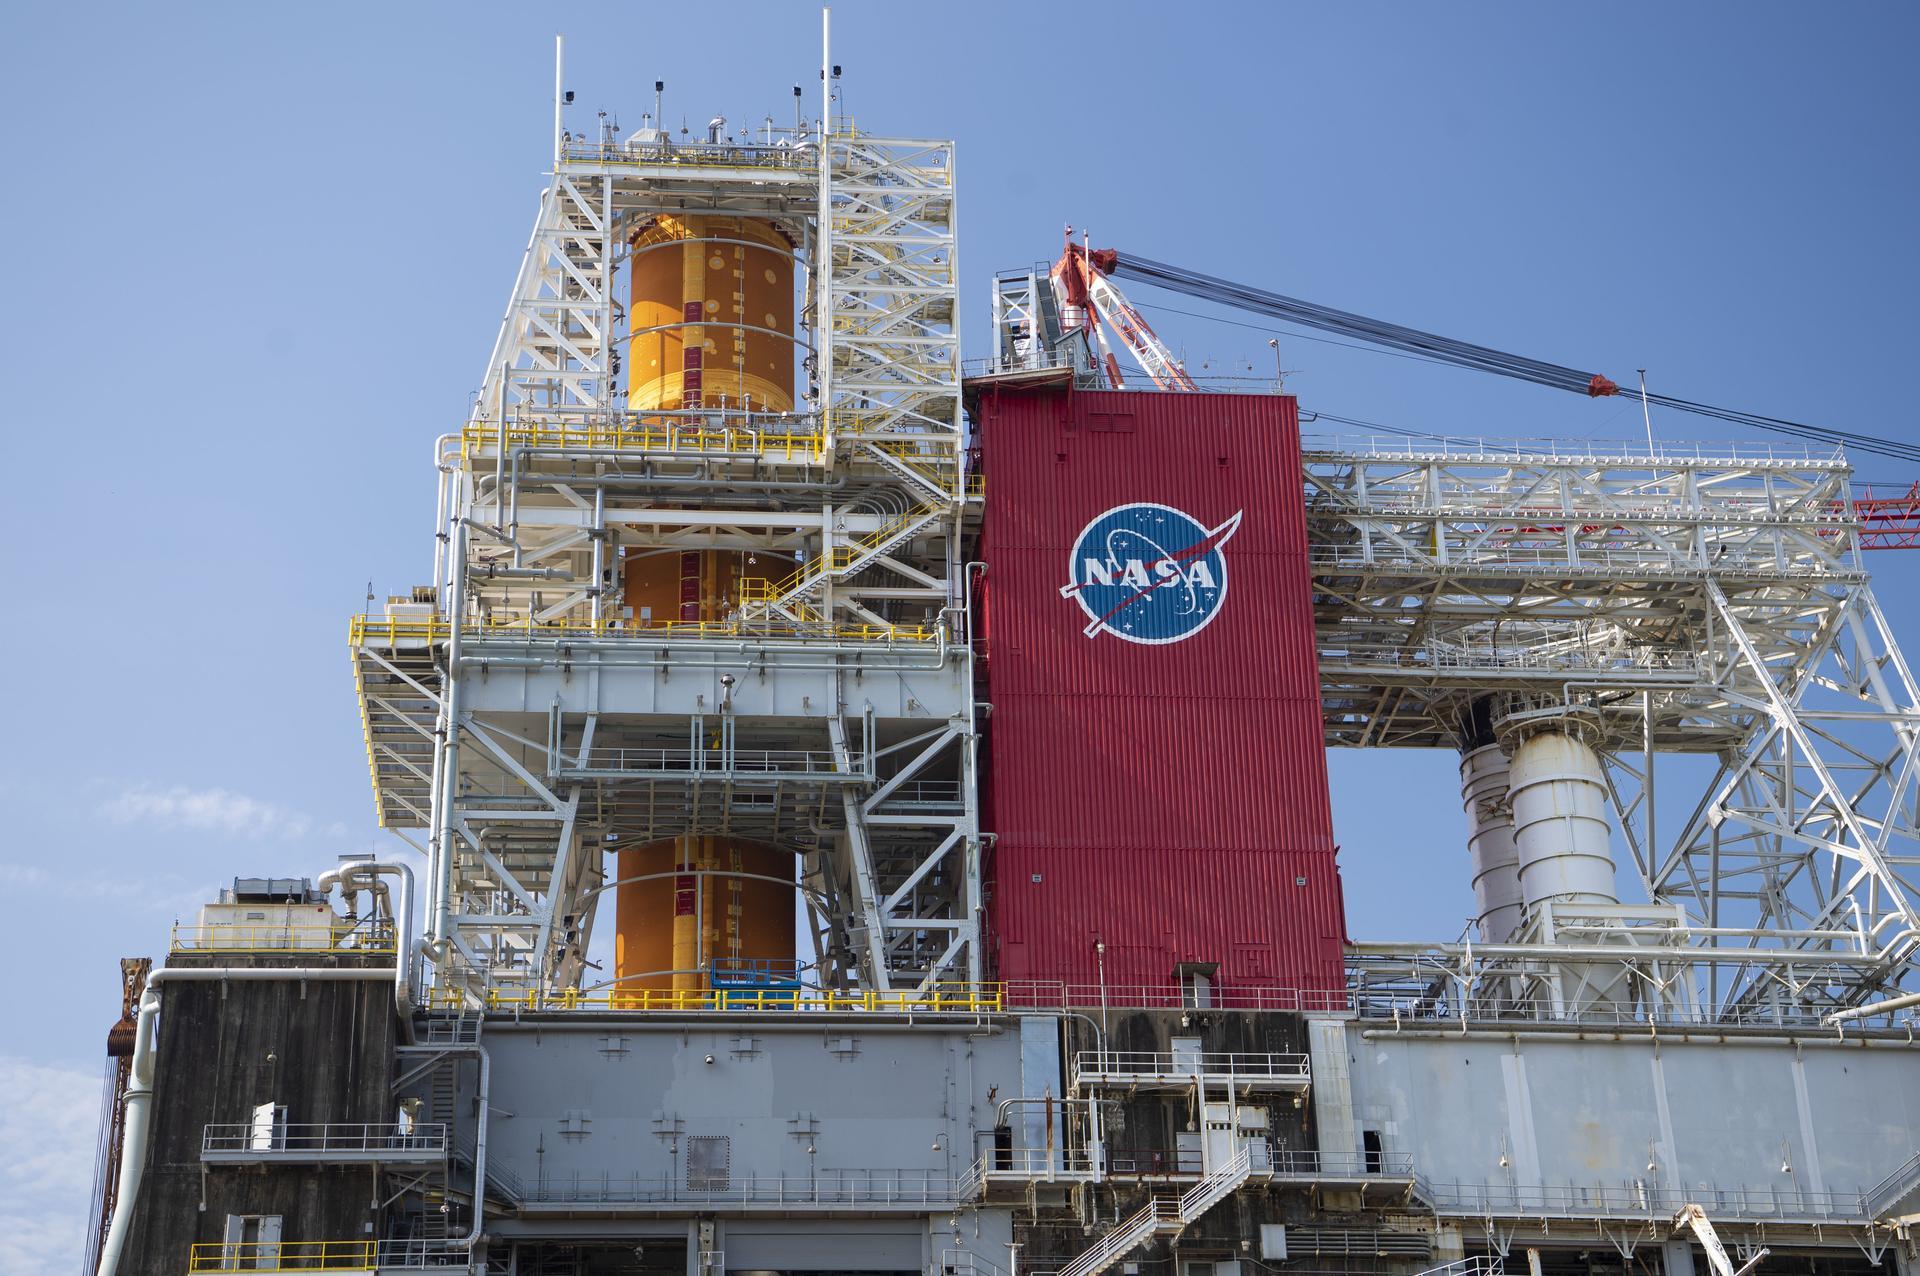 SLS Green Run test-firing to verify Core Stage design, analysis before first launch - NASASpaceflight.com